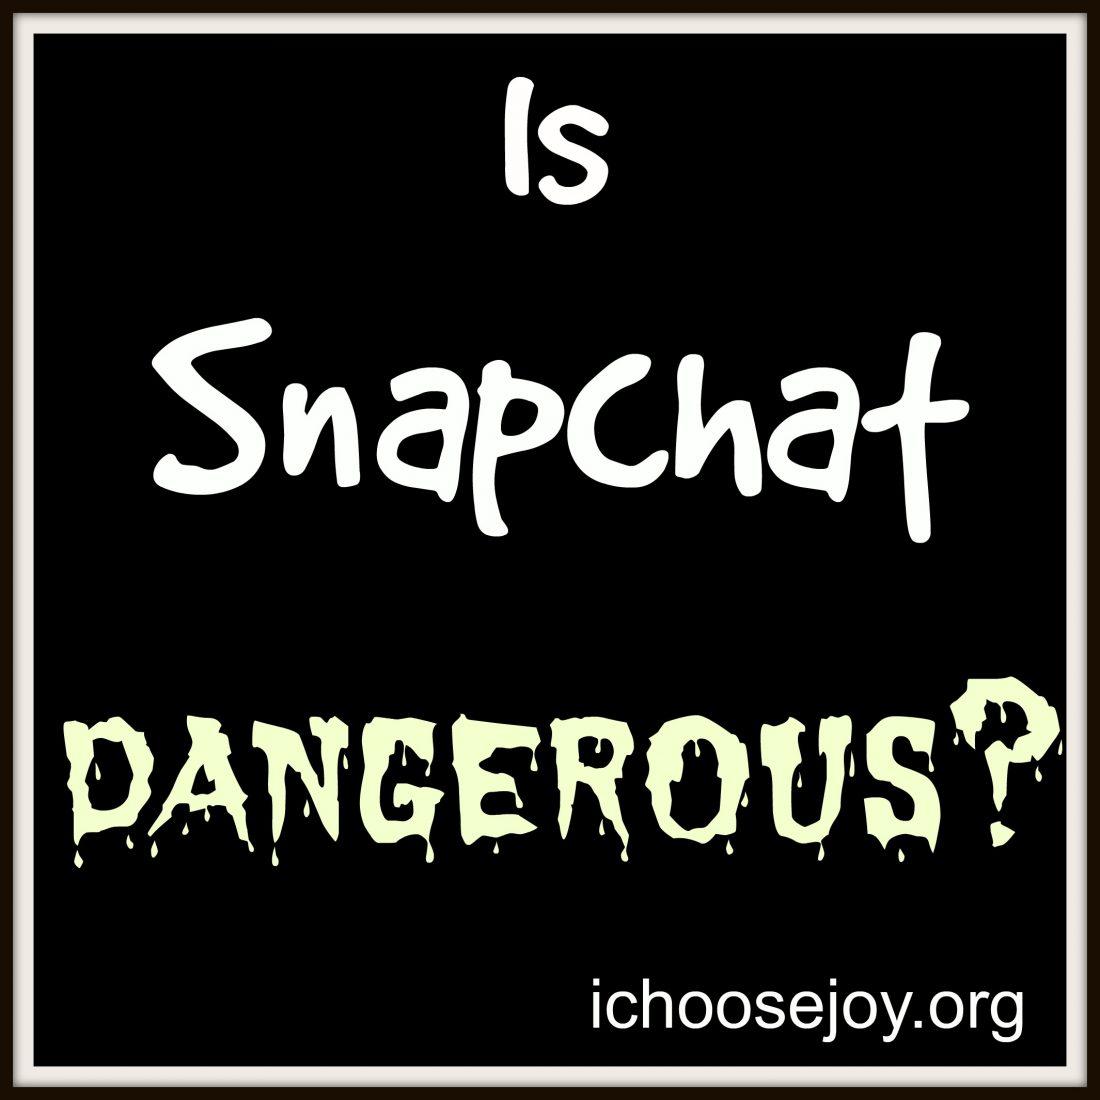 Is Snapchat Dangerous?